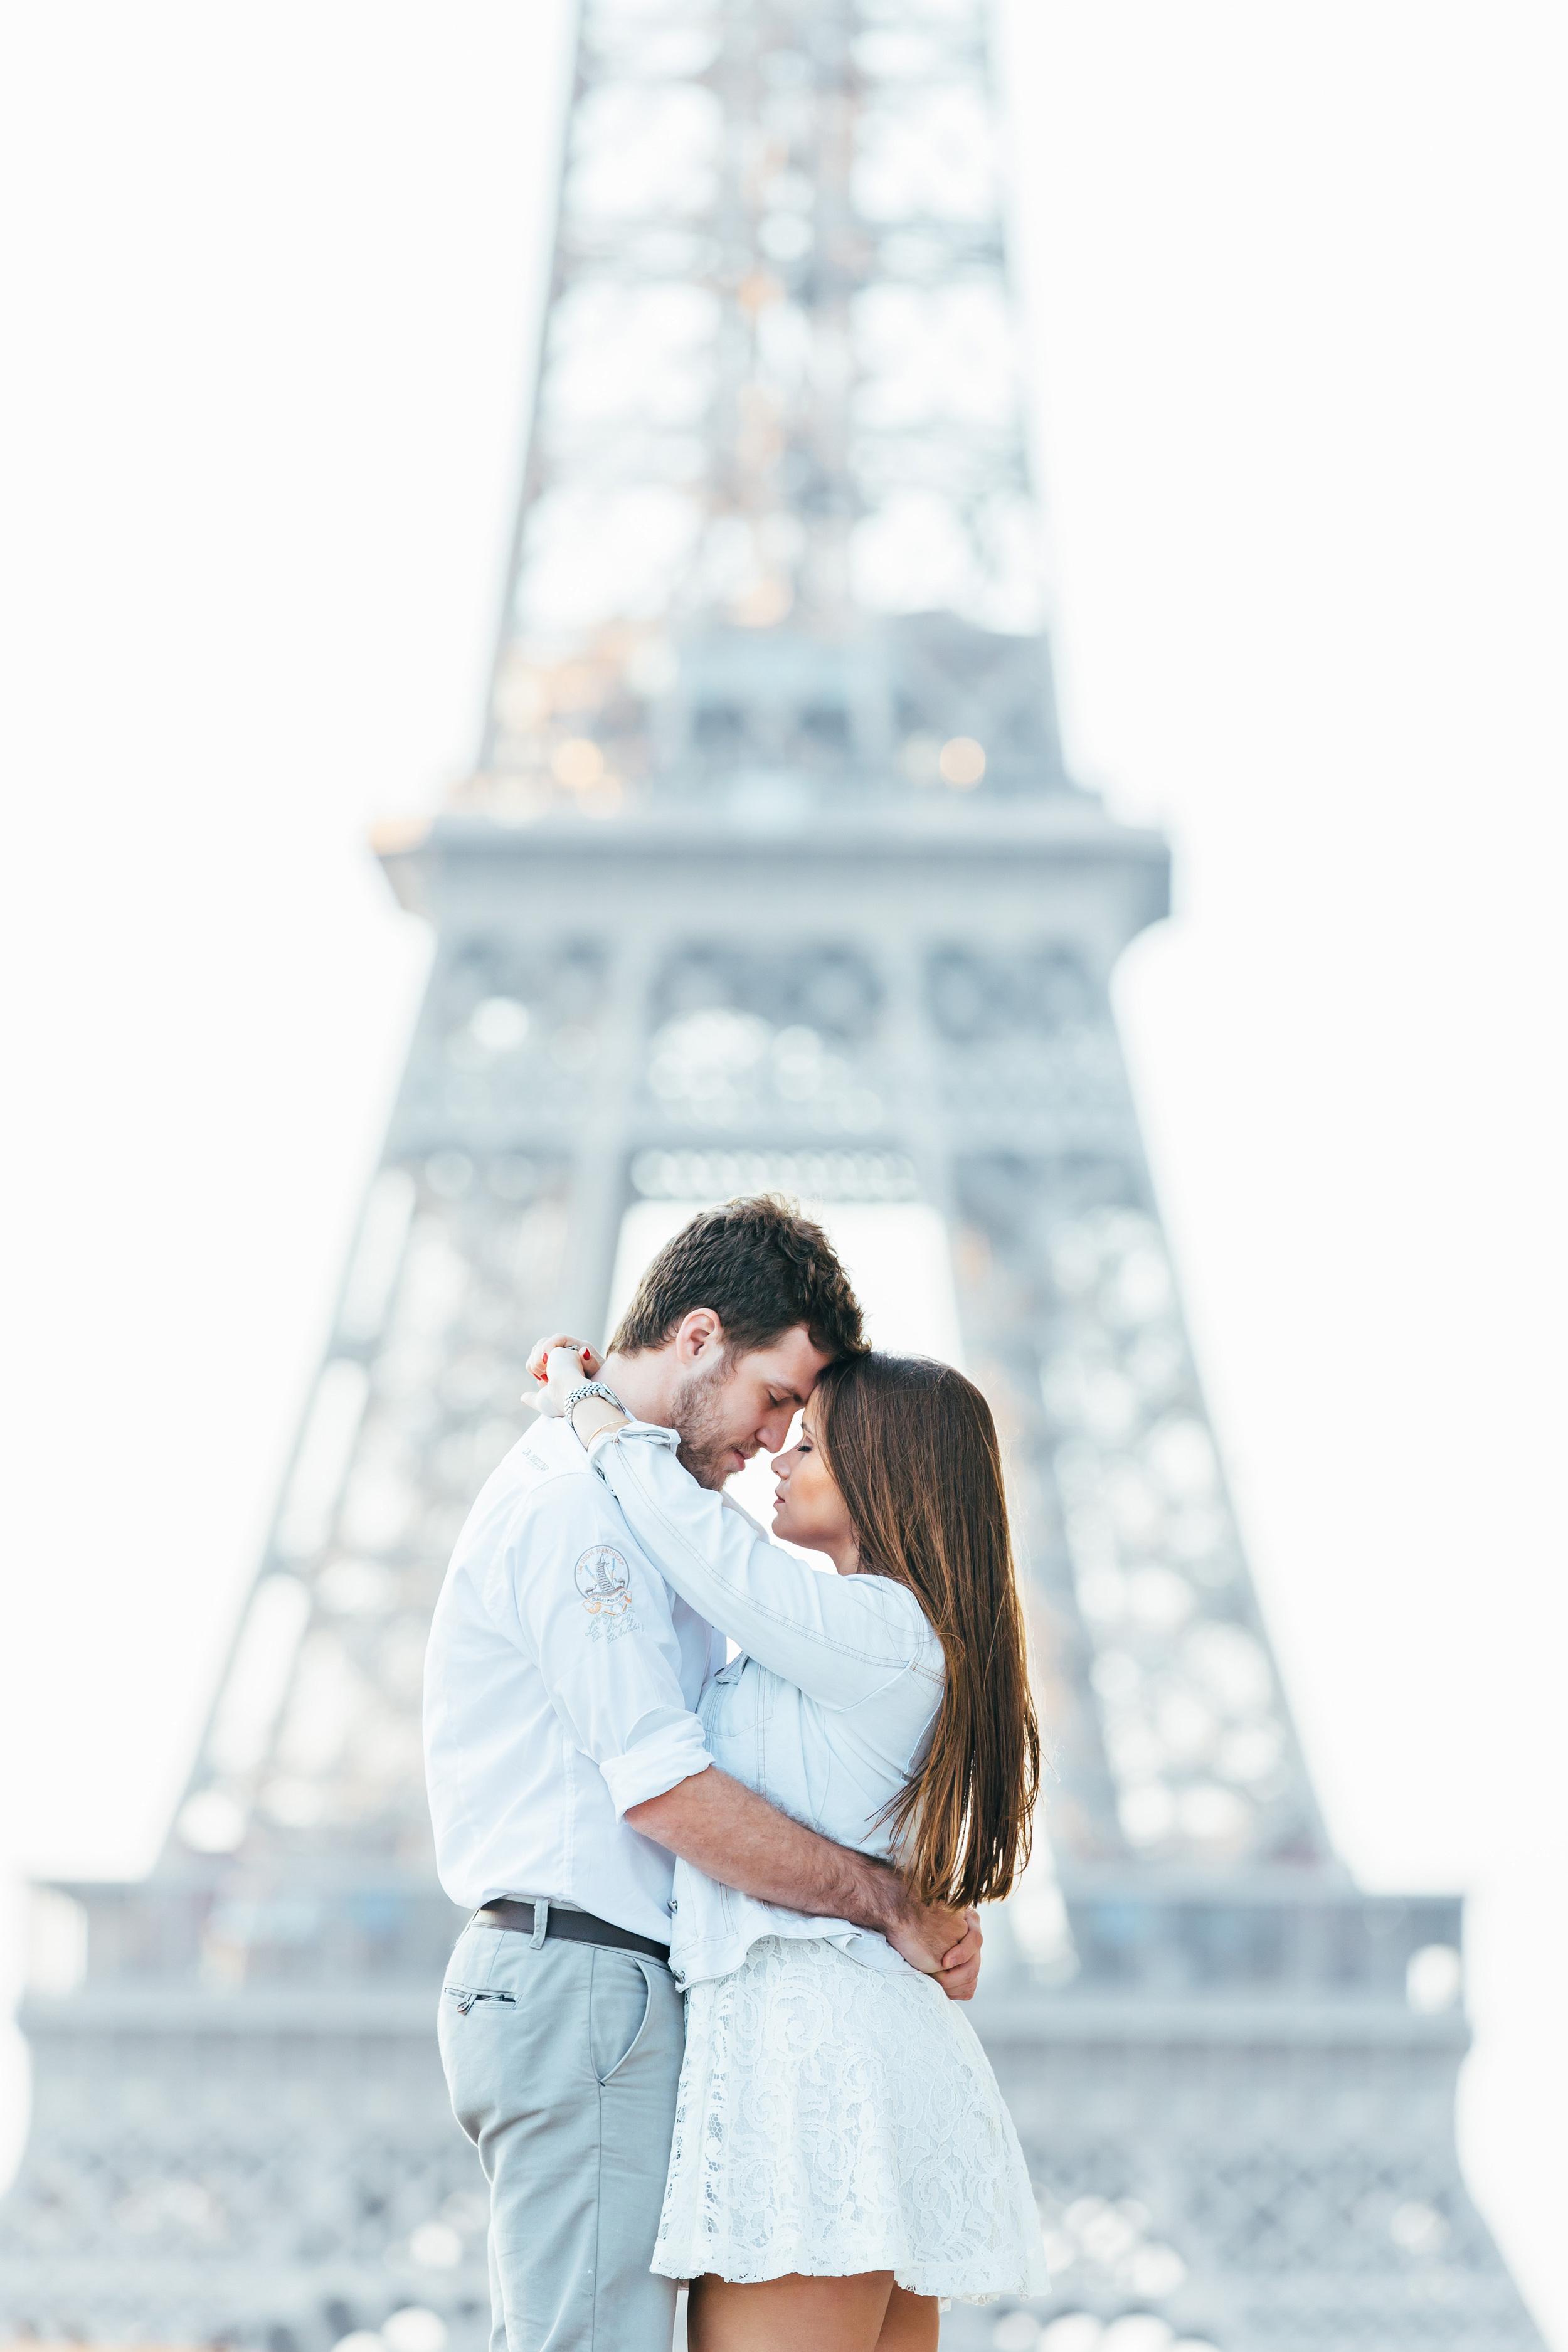 Photographer in Paris Tour Eiffel Lovestory Trocadero Iheartparisfr